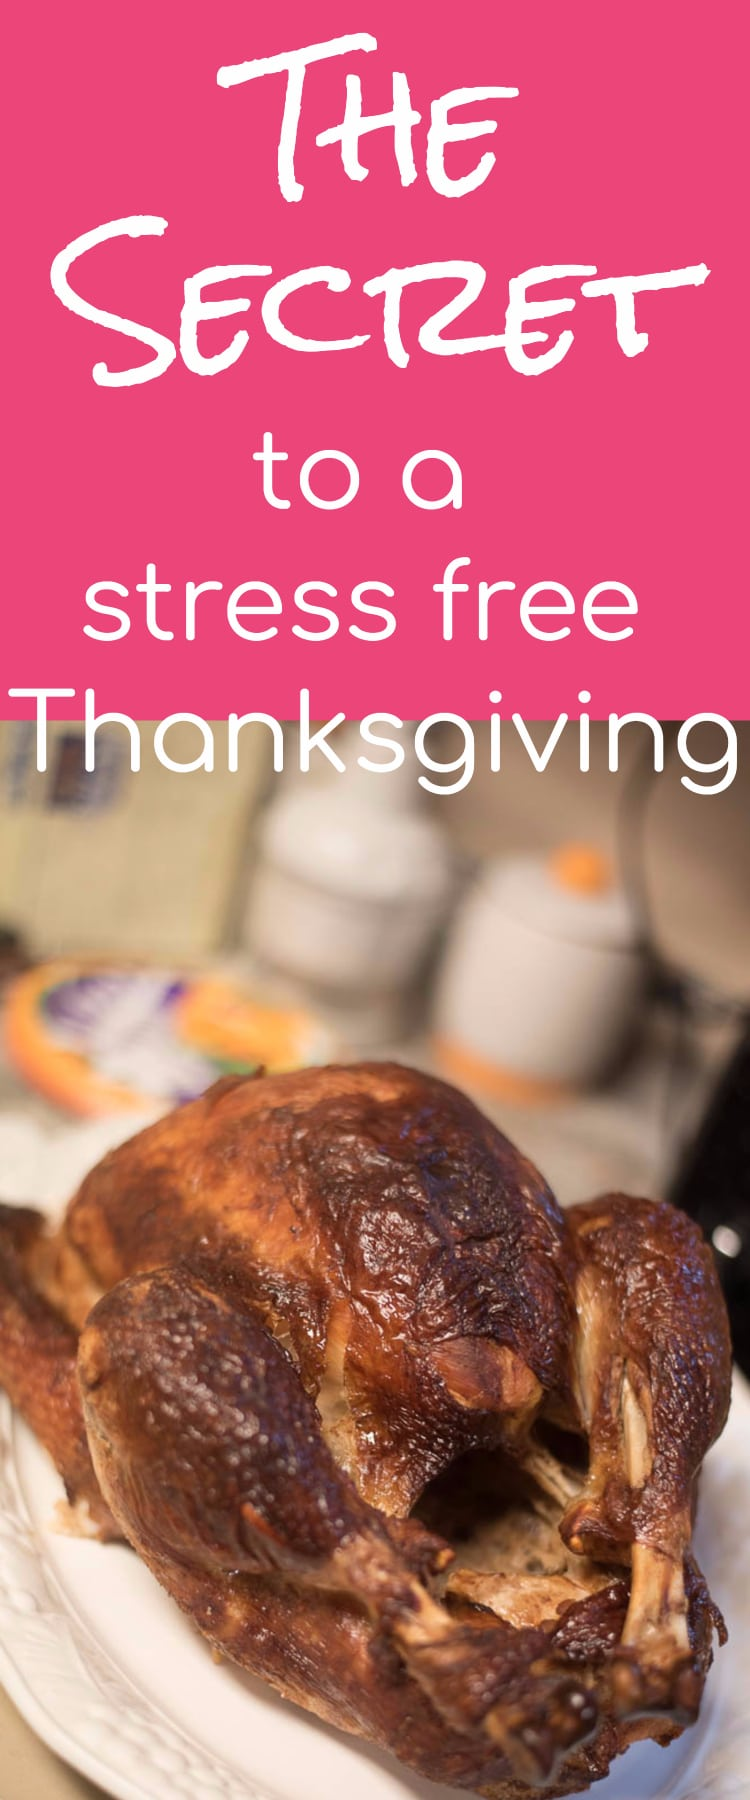 thanksgiving, / thanksgiving tips / thanksgiving dinner / #thanksgiving #thanksgivingdinner  via @clarkscondensed